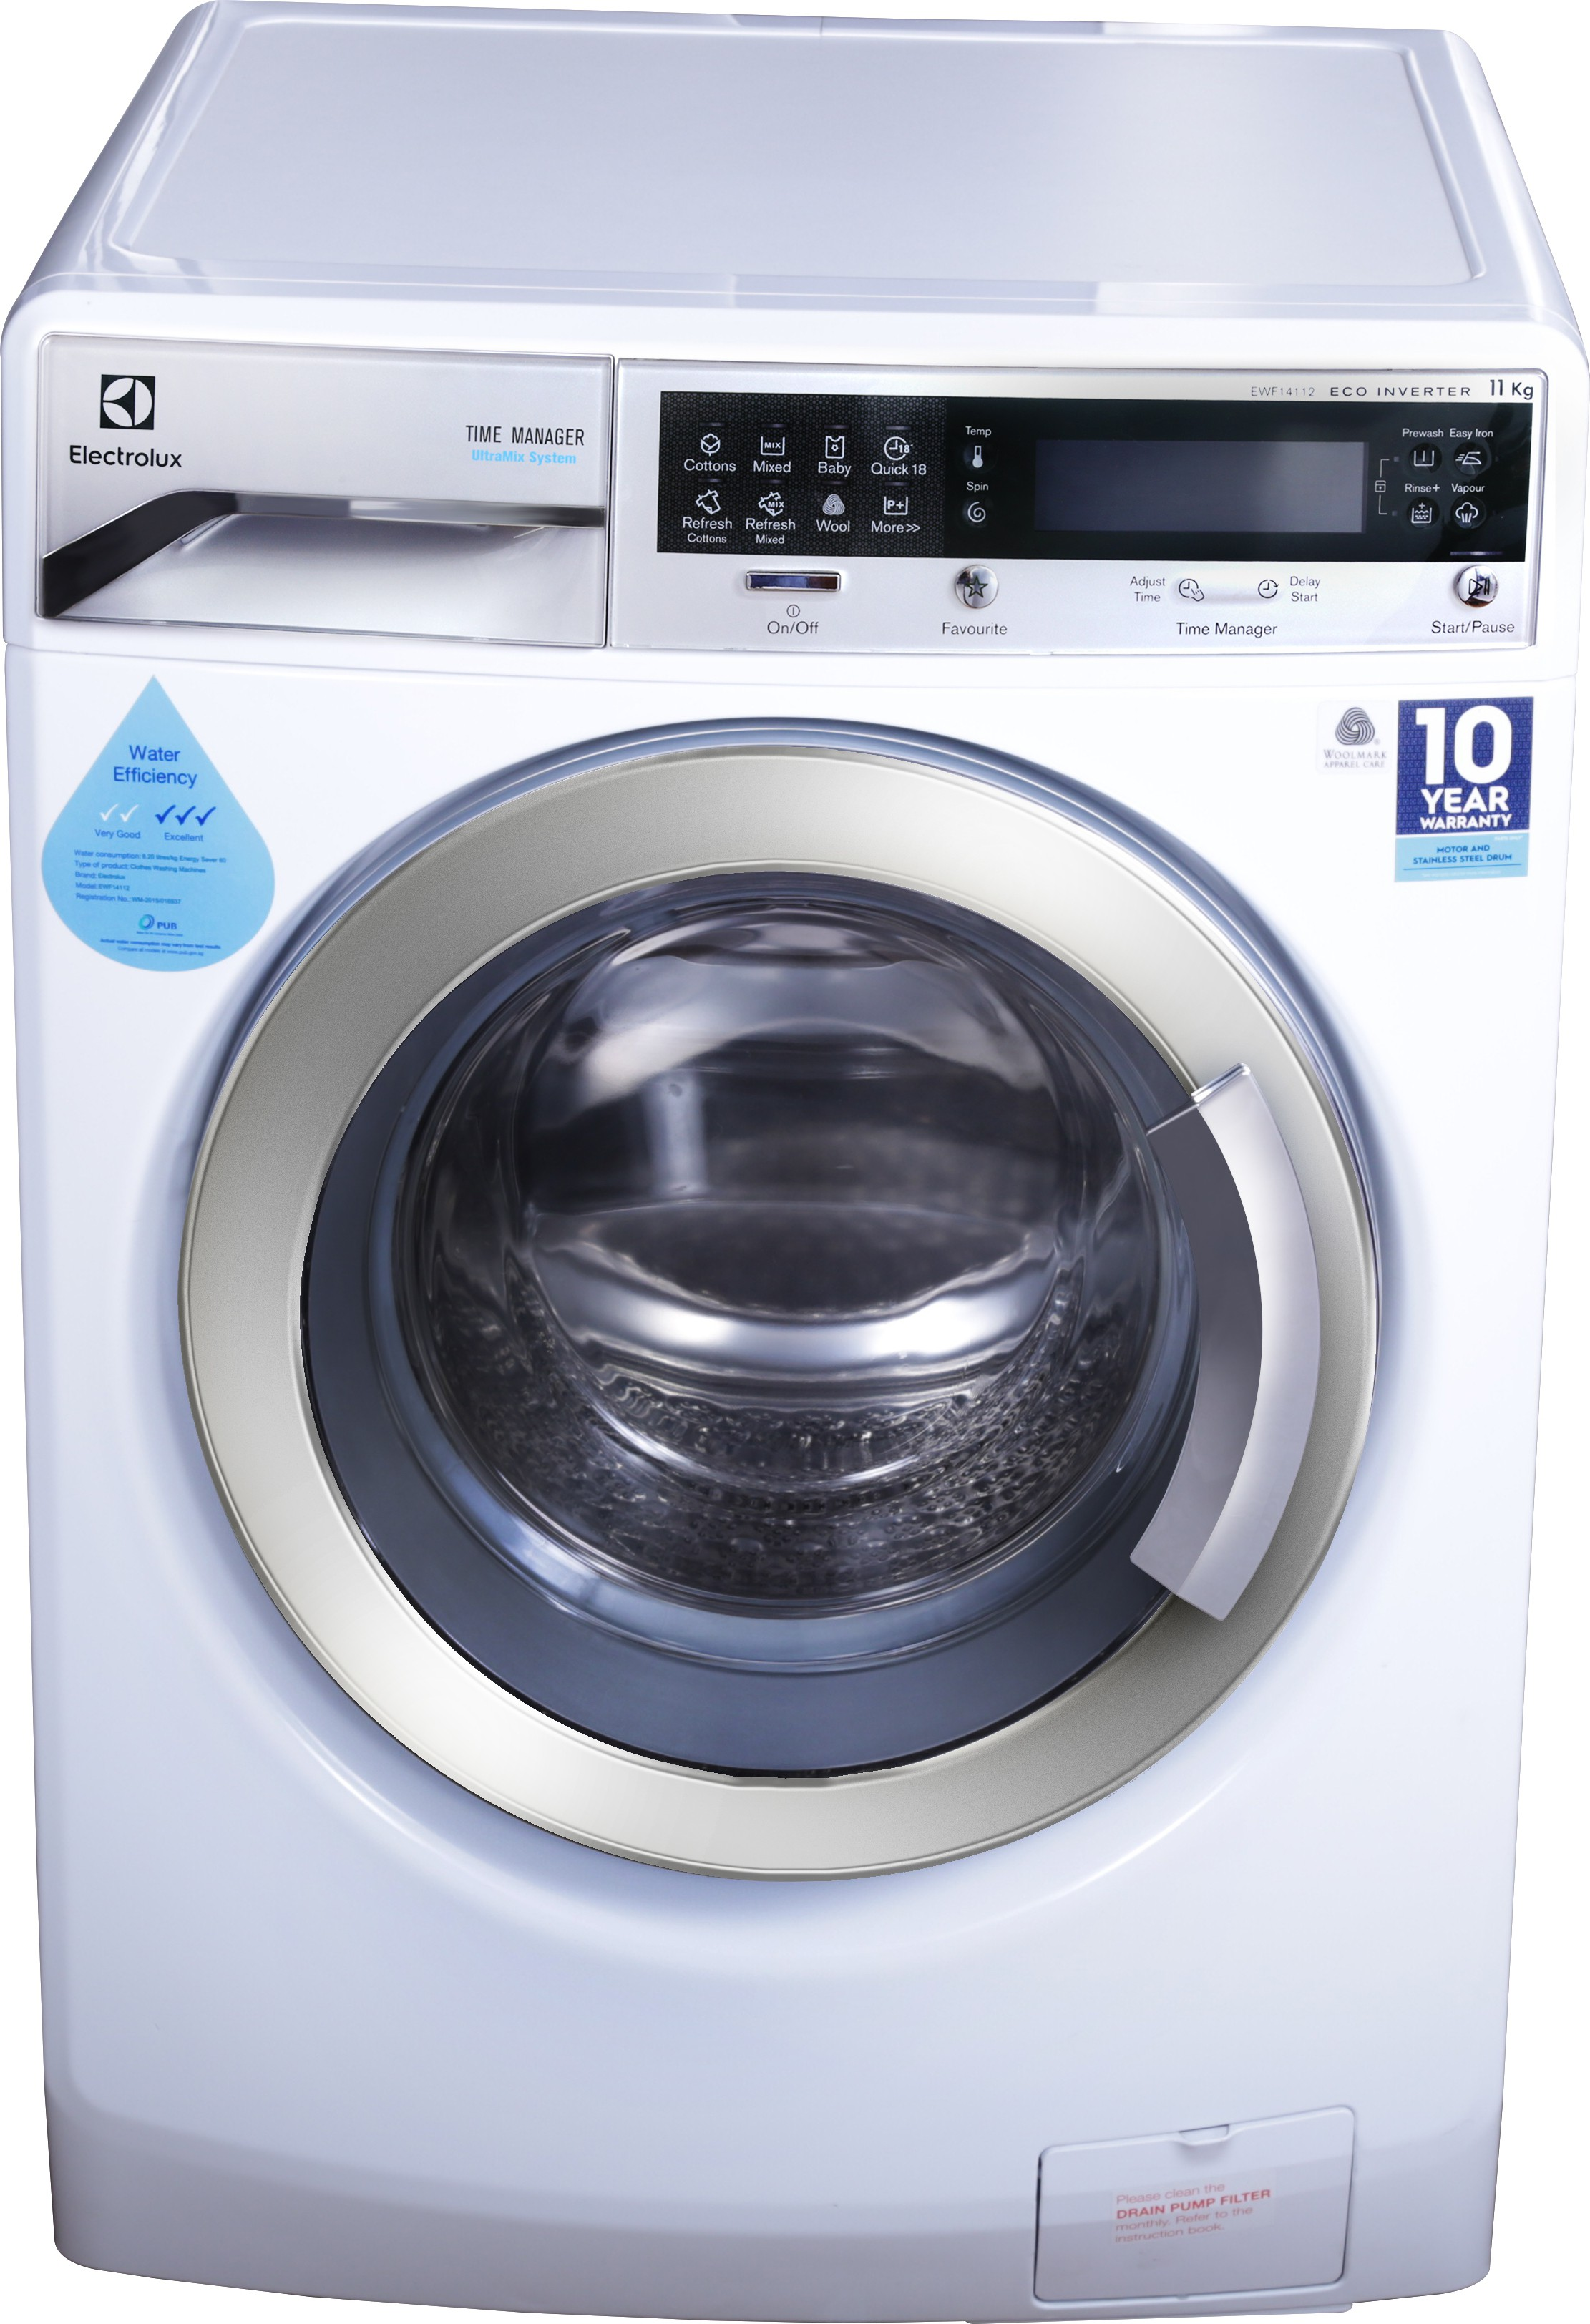 Electrolux 11 Kg Fully Automatic Front Load Washing Machine EWF14112 Image